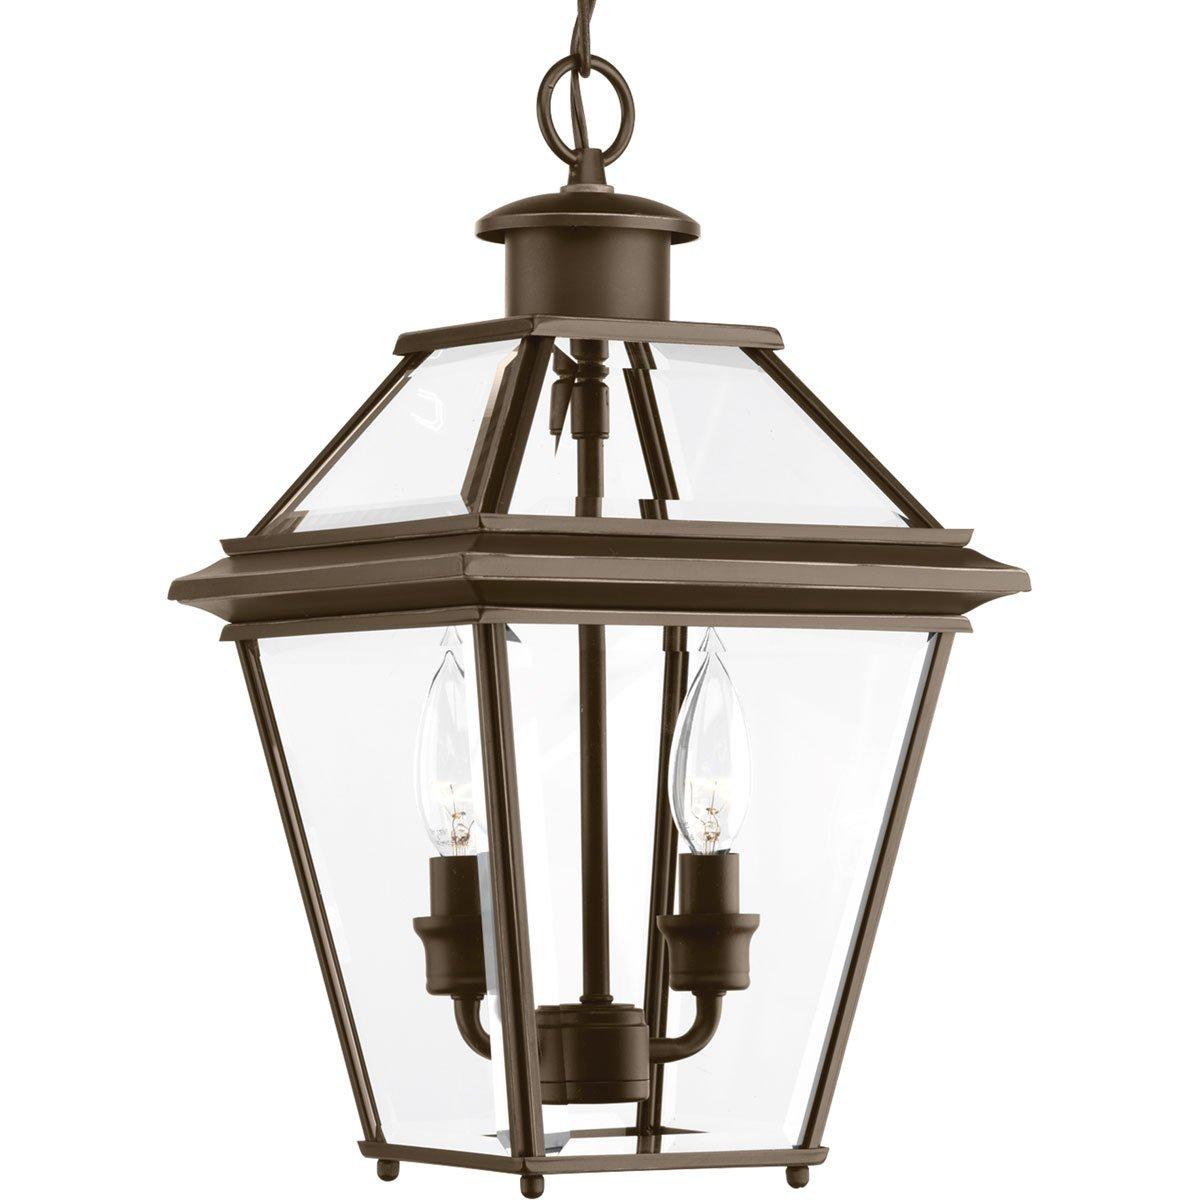 Progress Lighting P6537-20 Burlington Two-Light Hanging Lantern, Oil Rubbed Bronze